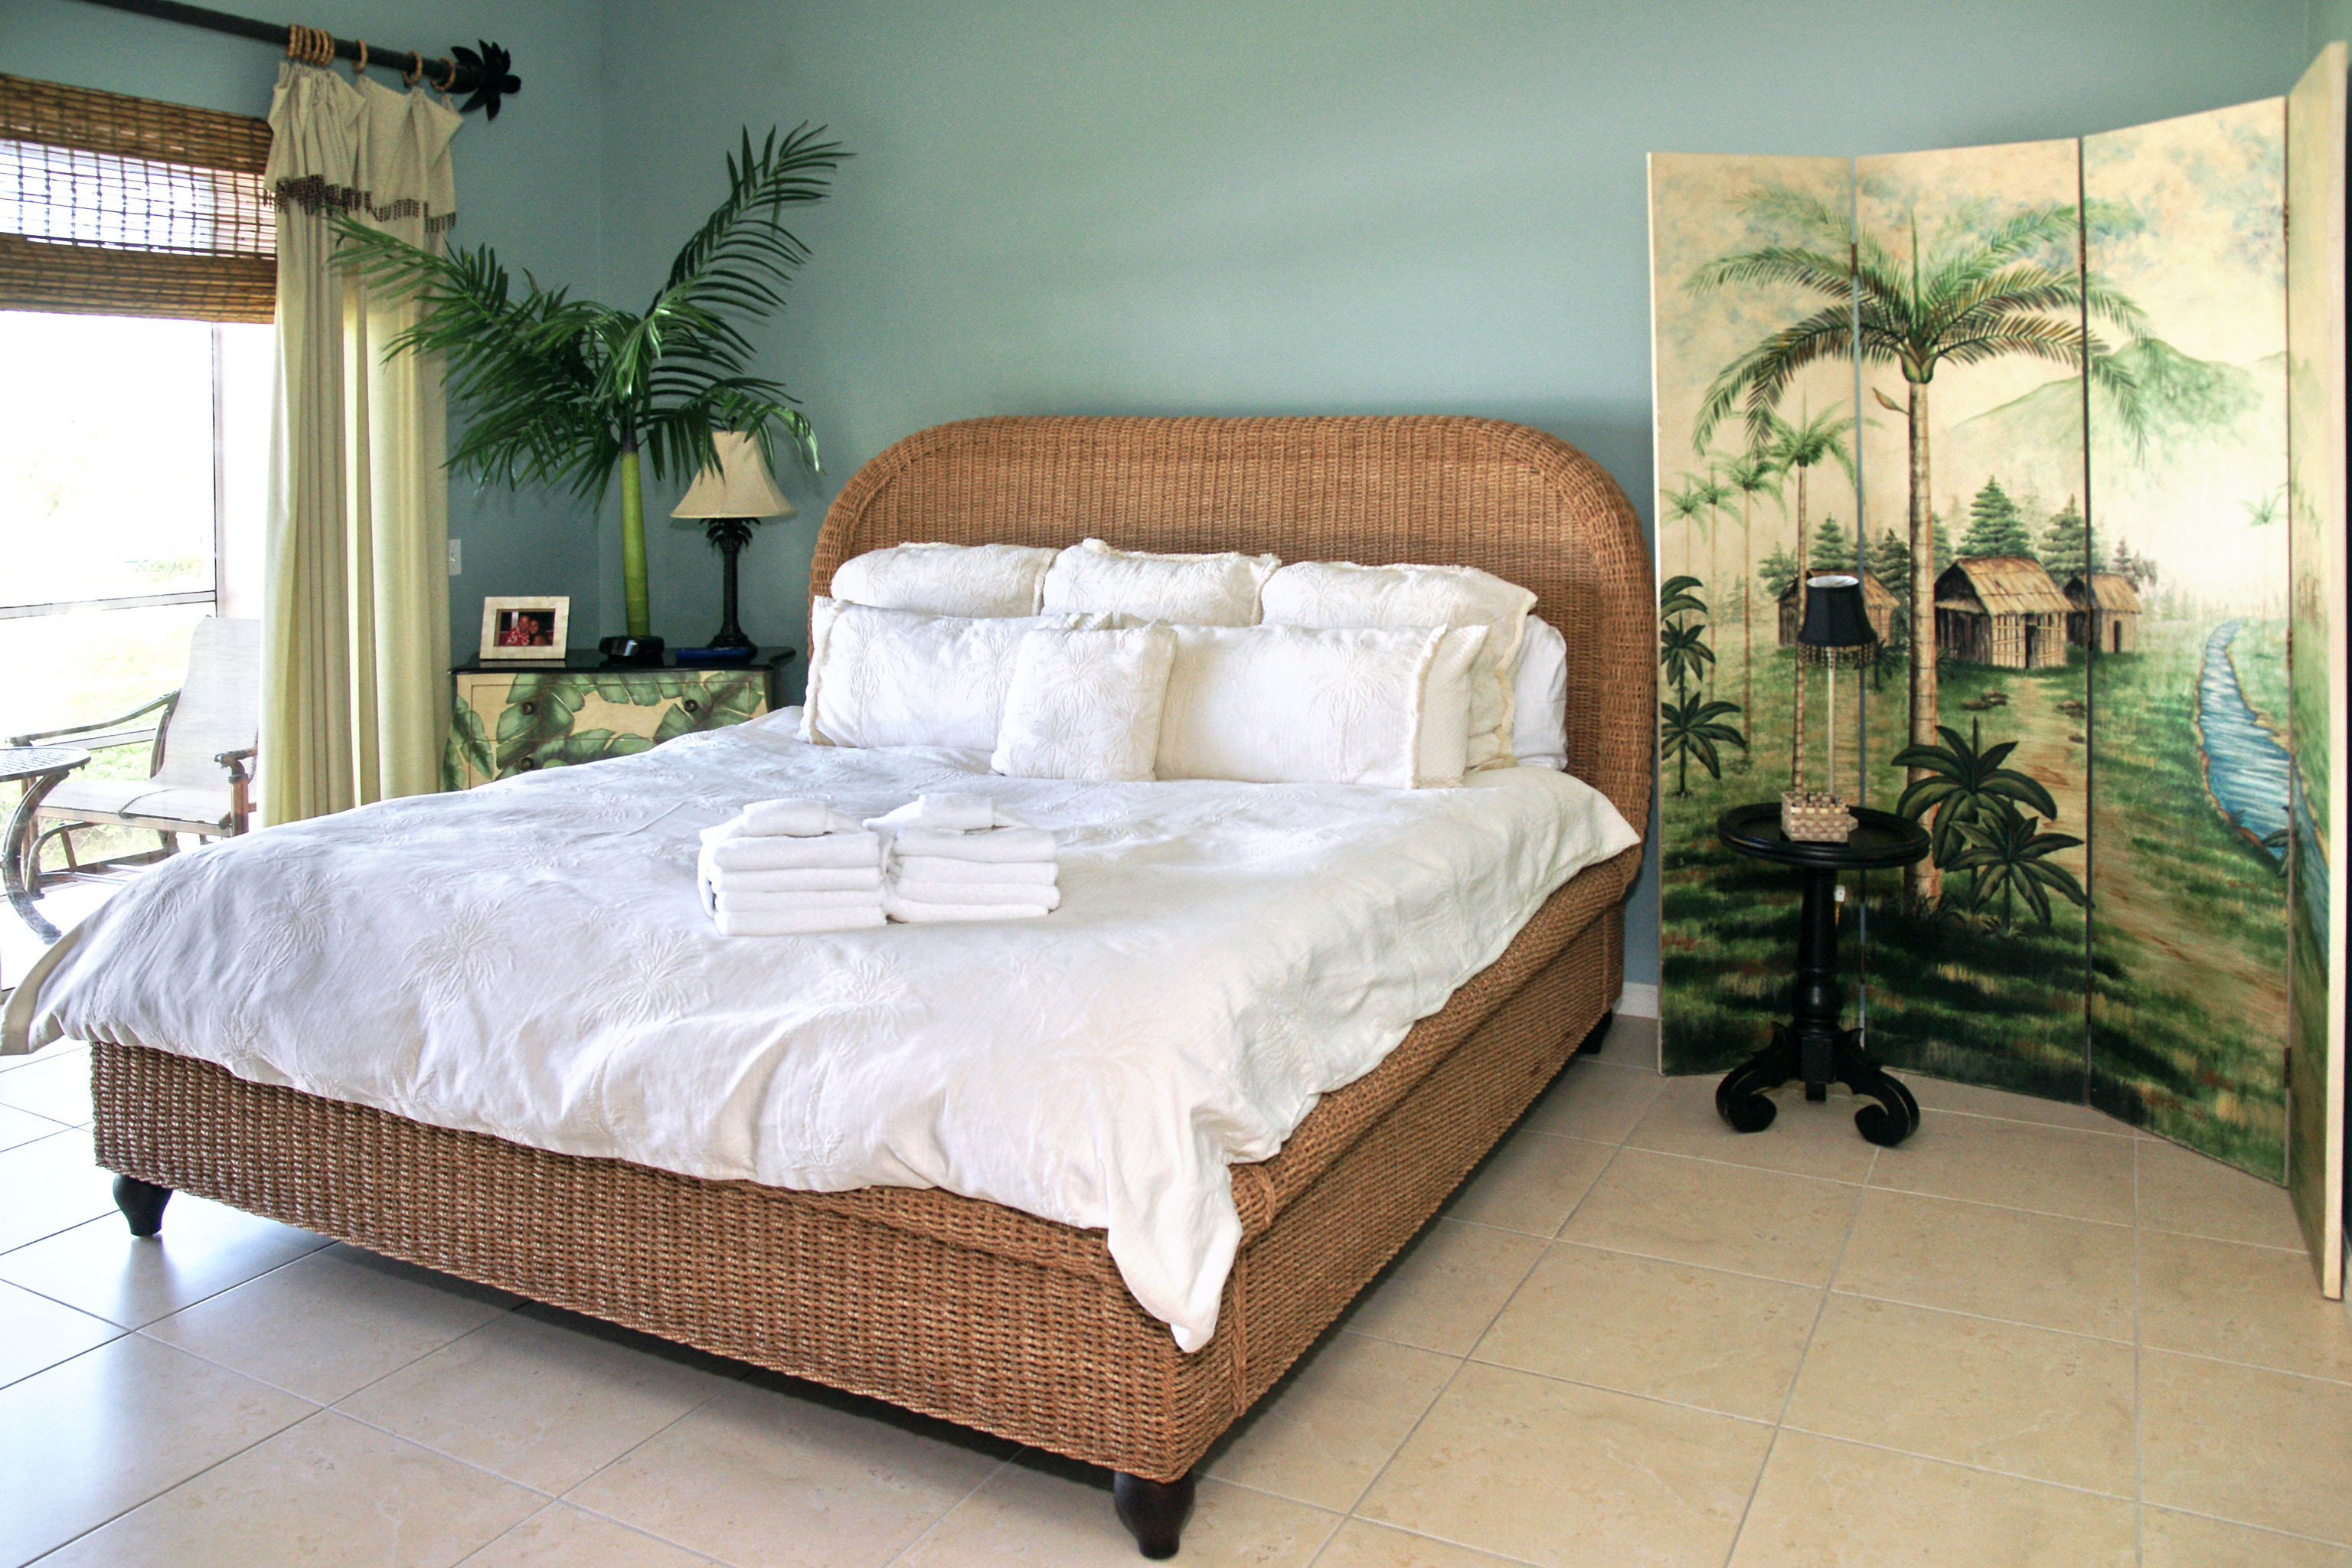 Beachfront Bedroom Resort property bed frame bed sheet green studio couch